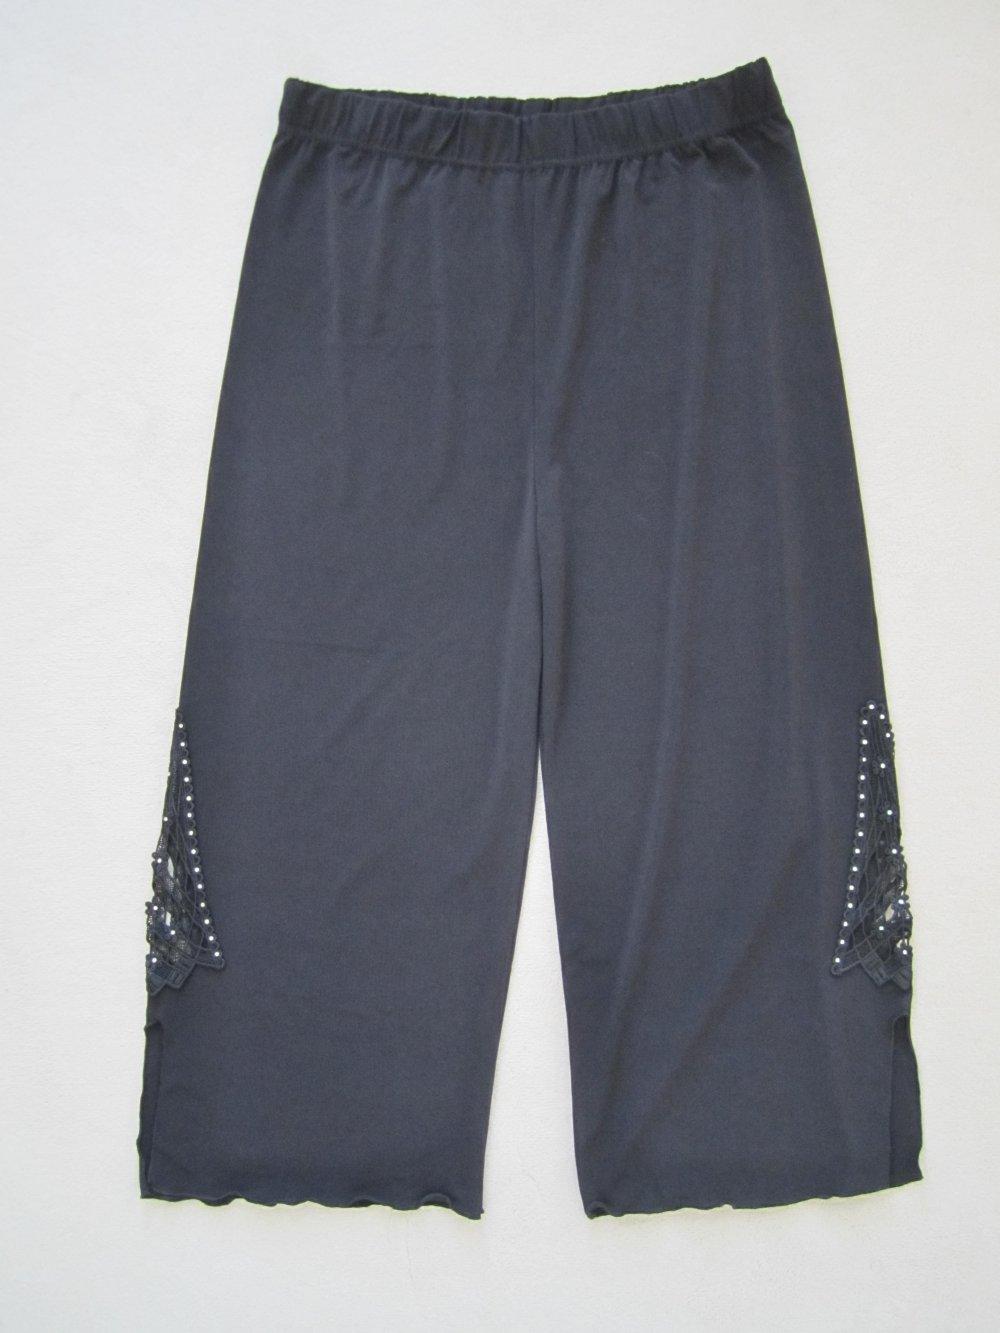 ... Vercotti Boutique 7 8 Hose schwarz elegant Gr.S 38 40 Straß Spitze . c8dde92b66